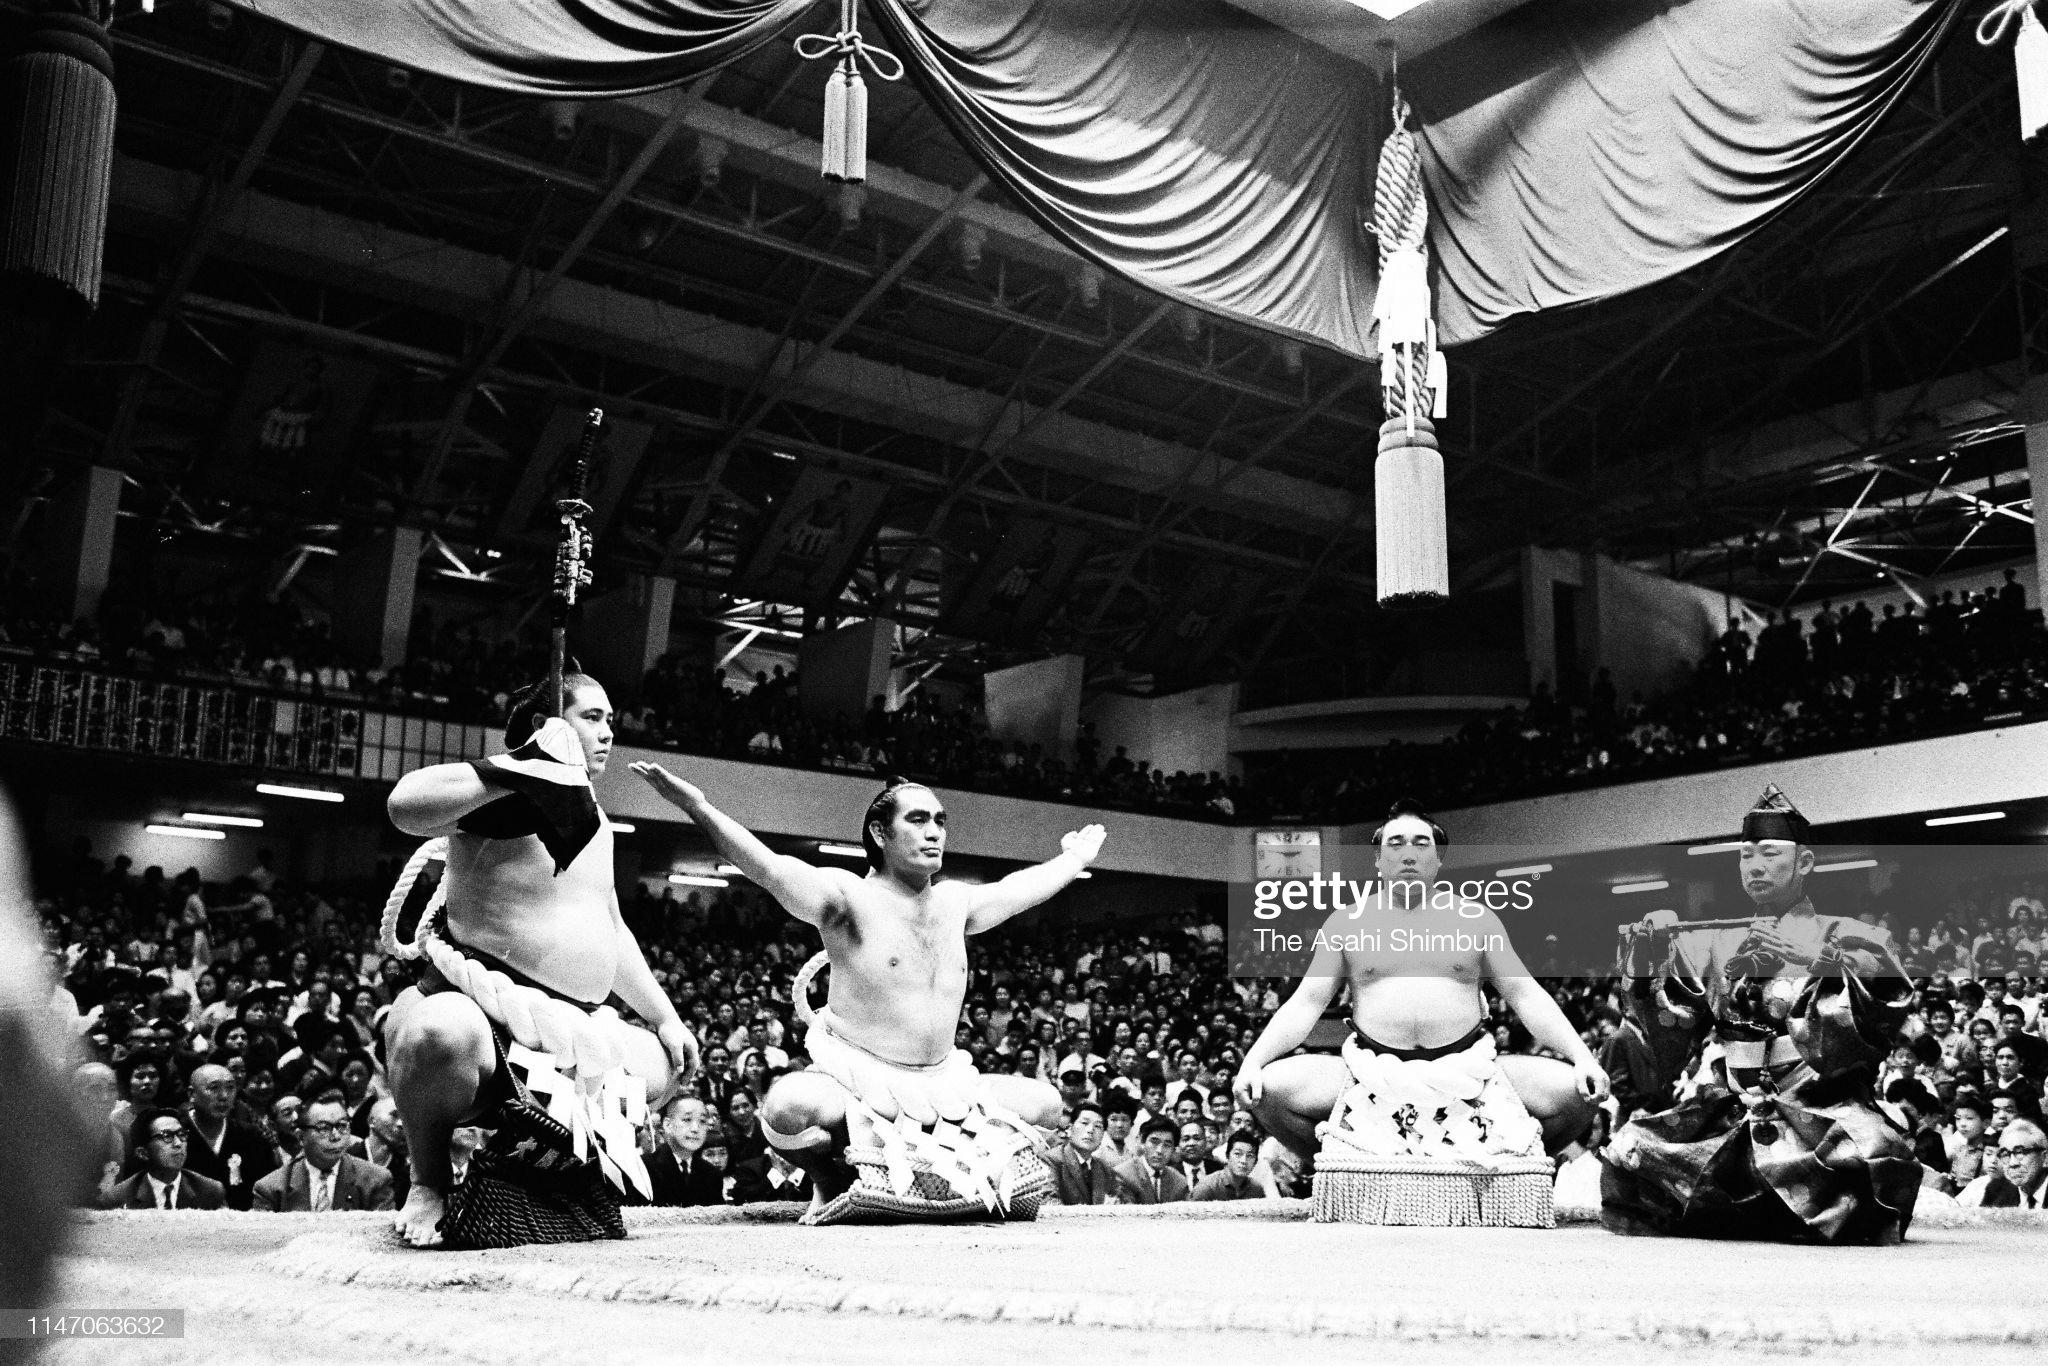 former-yokozuna-asashio-performs-the-doh